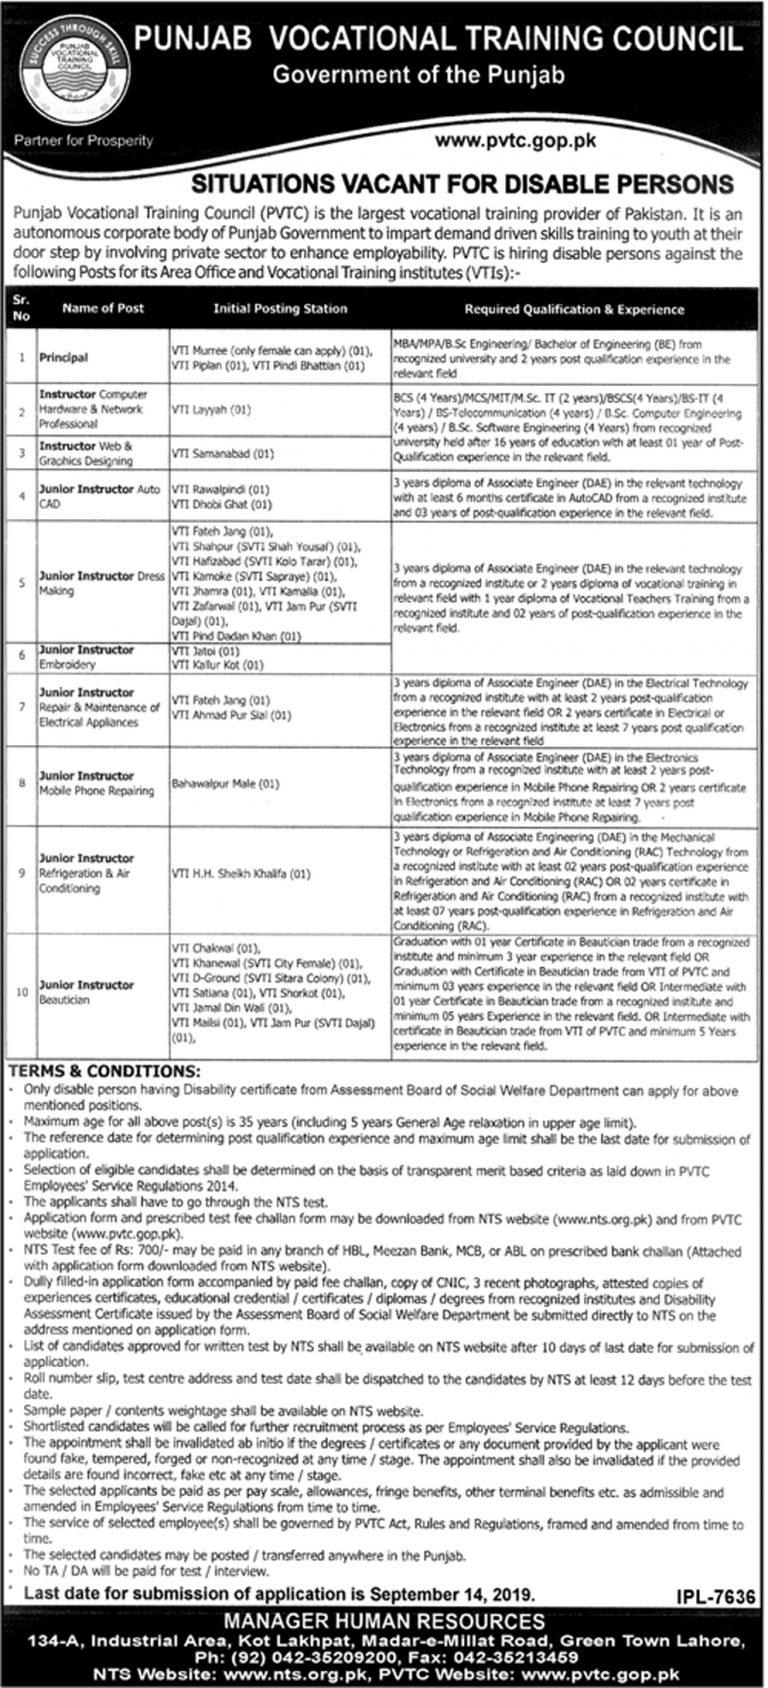 PVTC Jobs 2019 Punjab Vocational Training Council NTS Application Form Download